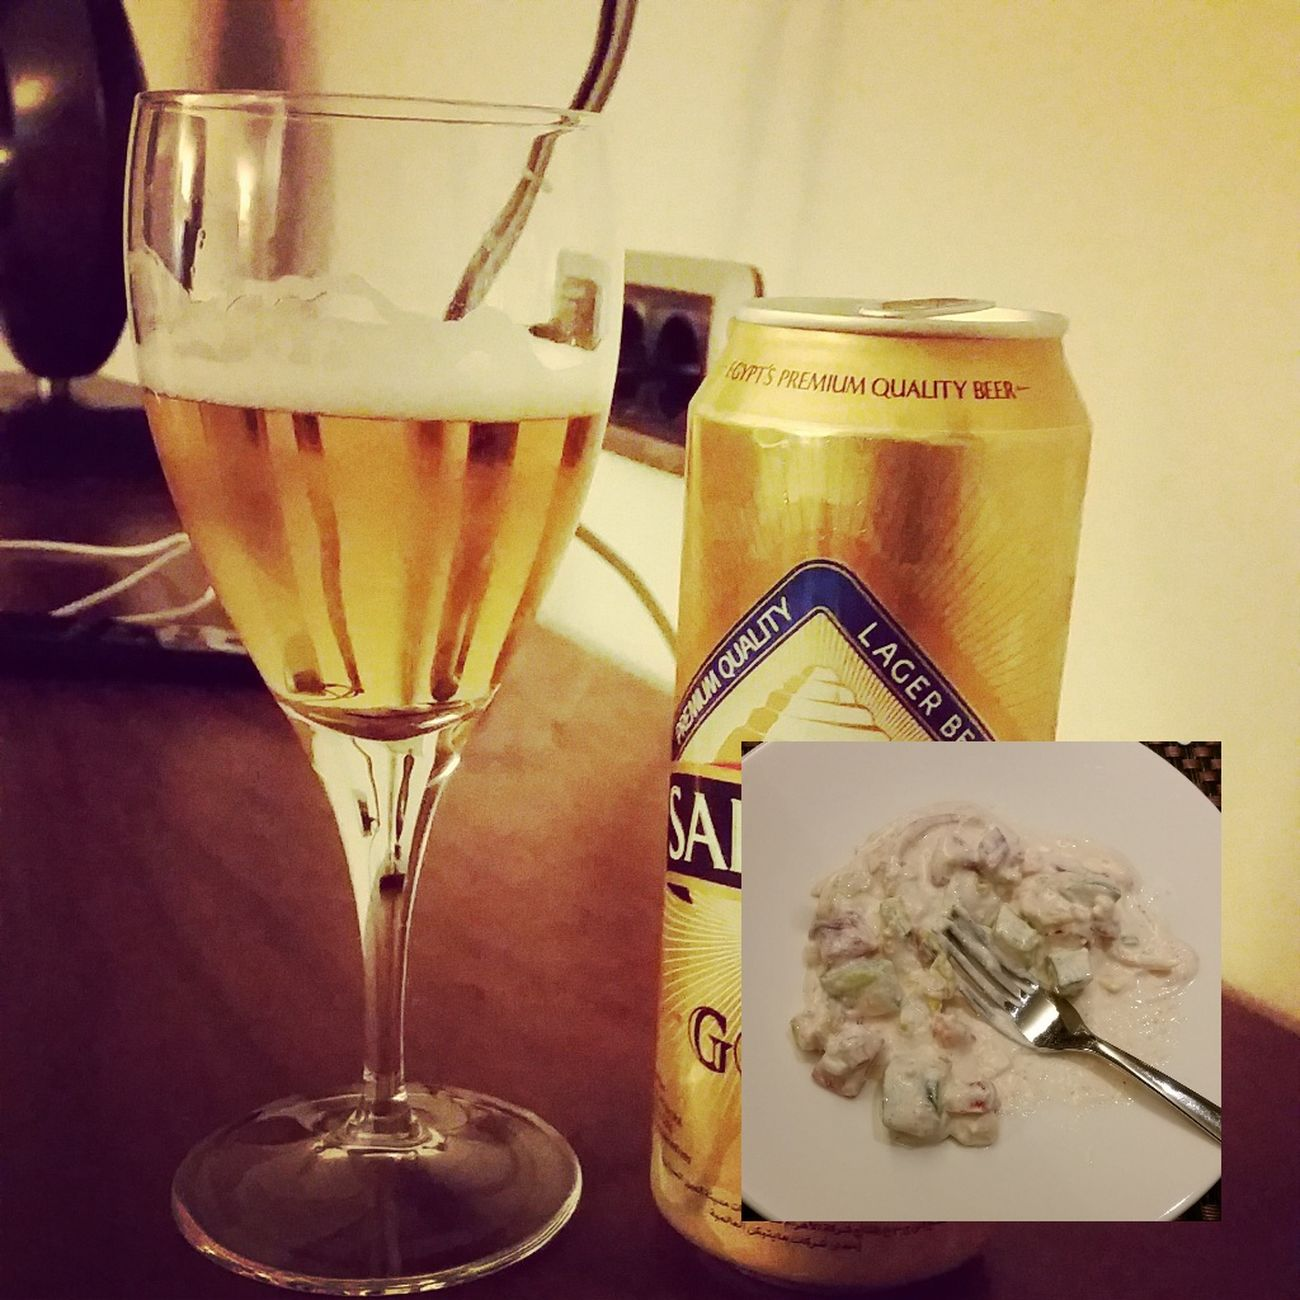 4% alcohol not bad! Haha